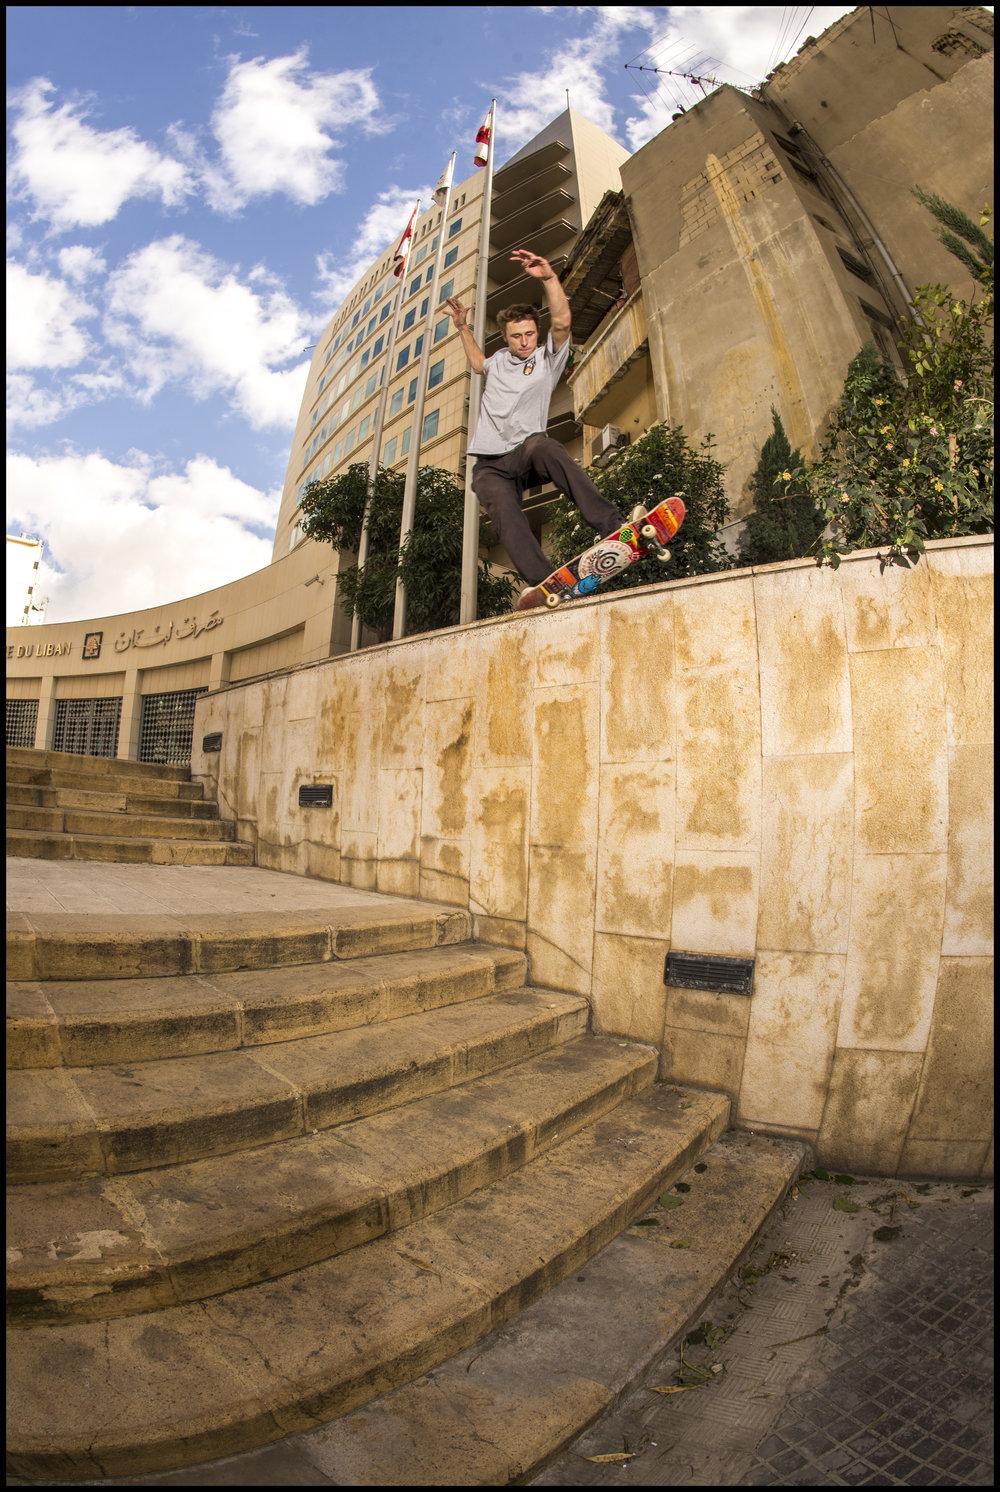 Backside 5-0 by Patrik Wallner in Beirut, Lebanon